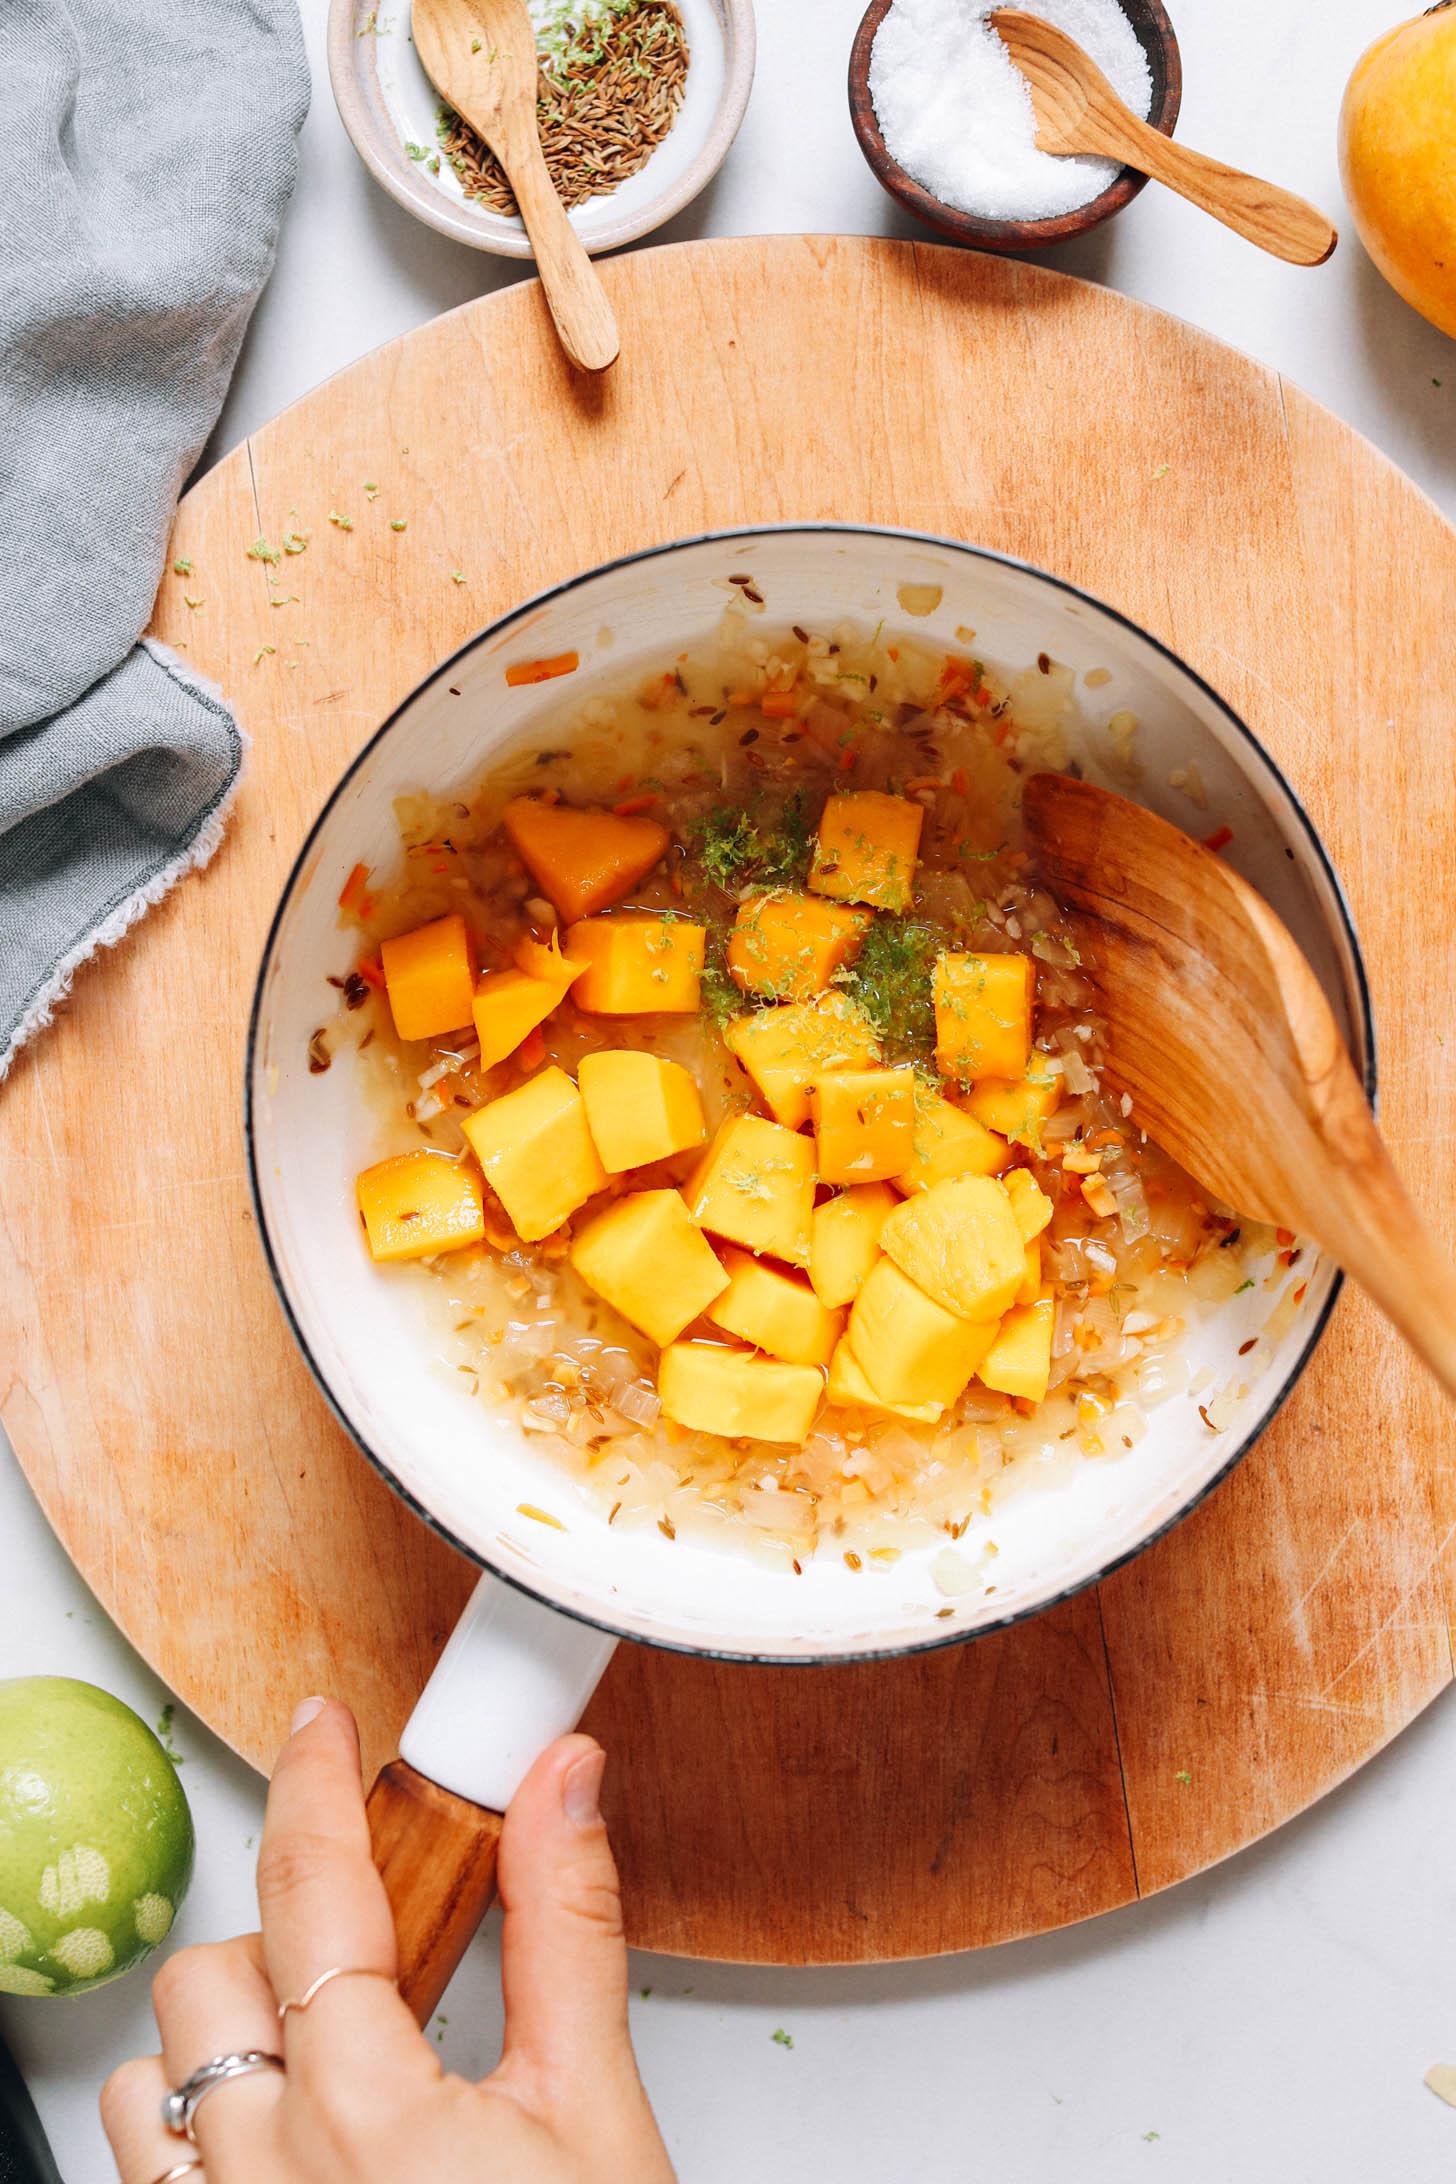 Saucepan of mango, sautéed onion, cumin seeds, lime zest, lime juice, water, and vinegar